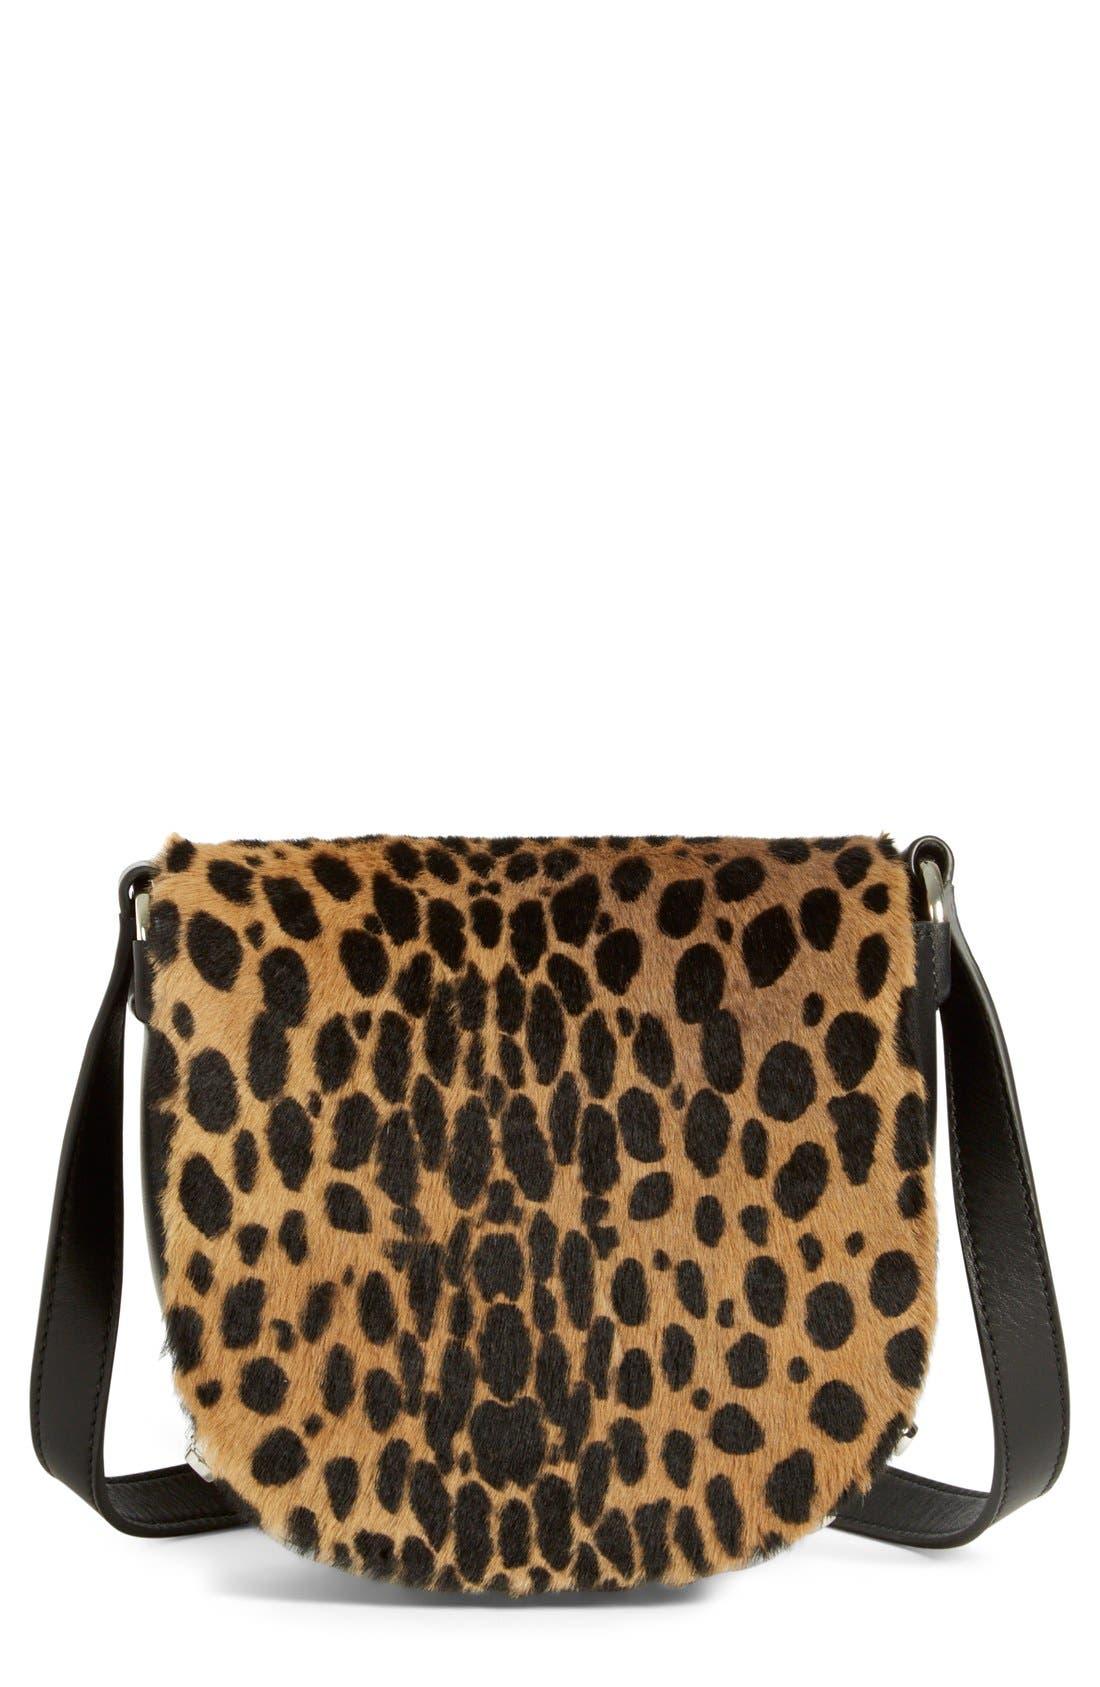 Main Image - Alexander Wang 'Mini Lia' Cheetah Print Genuine Kangaroo Fur Crossbody Bag